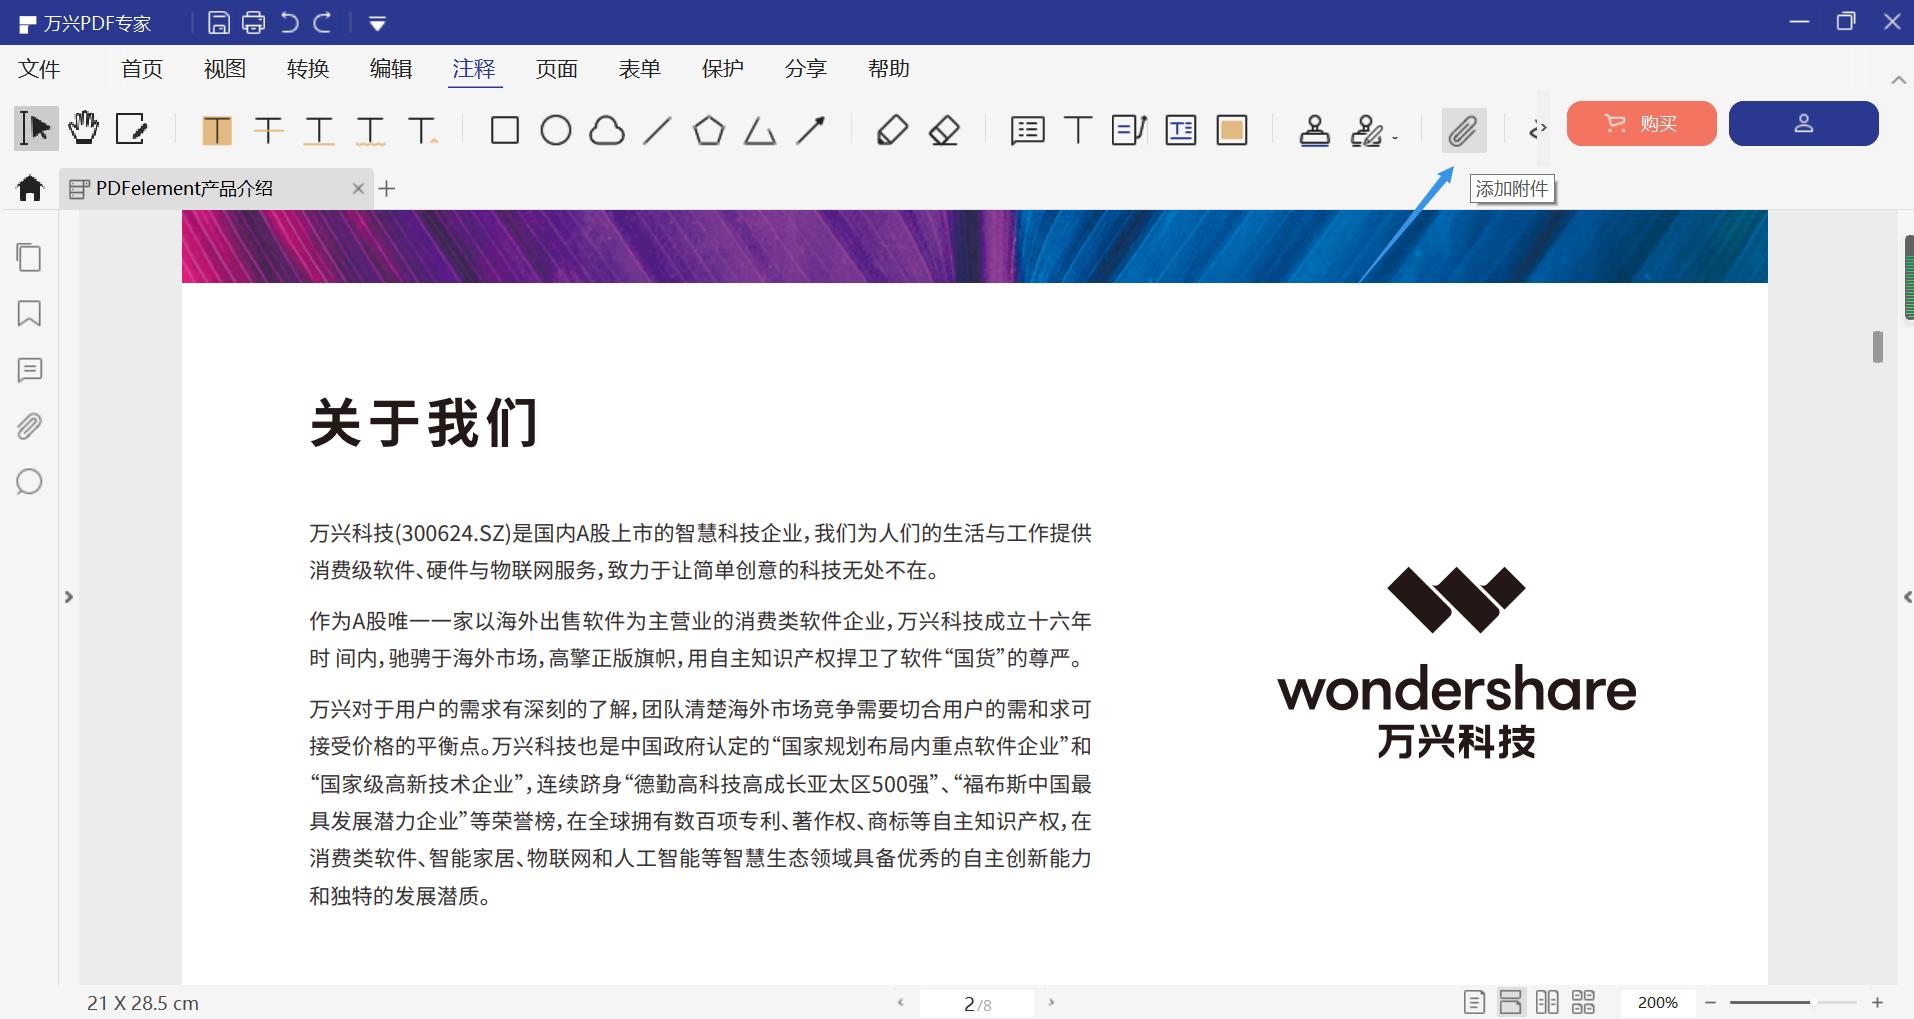 PDF文件添加附件步骤一